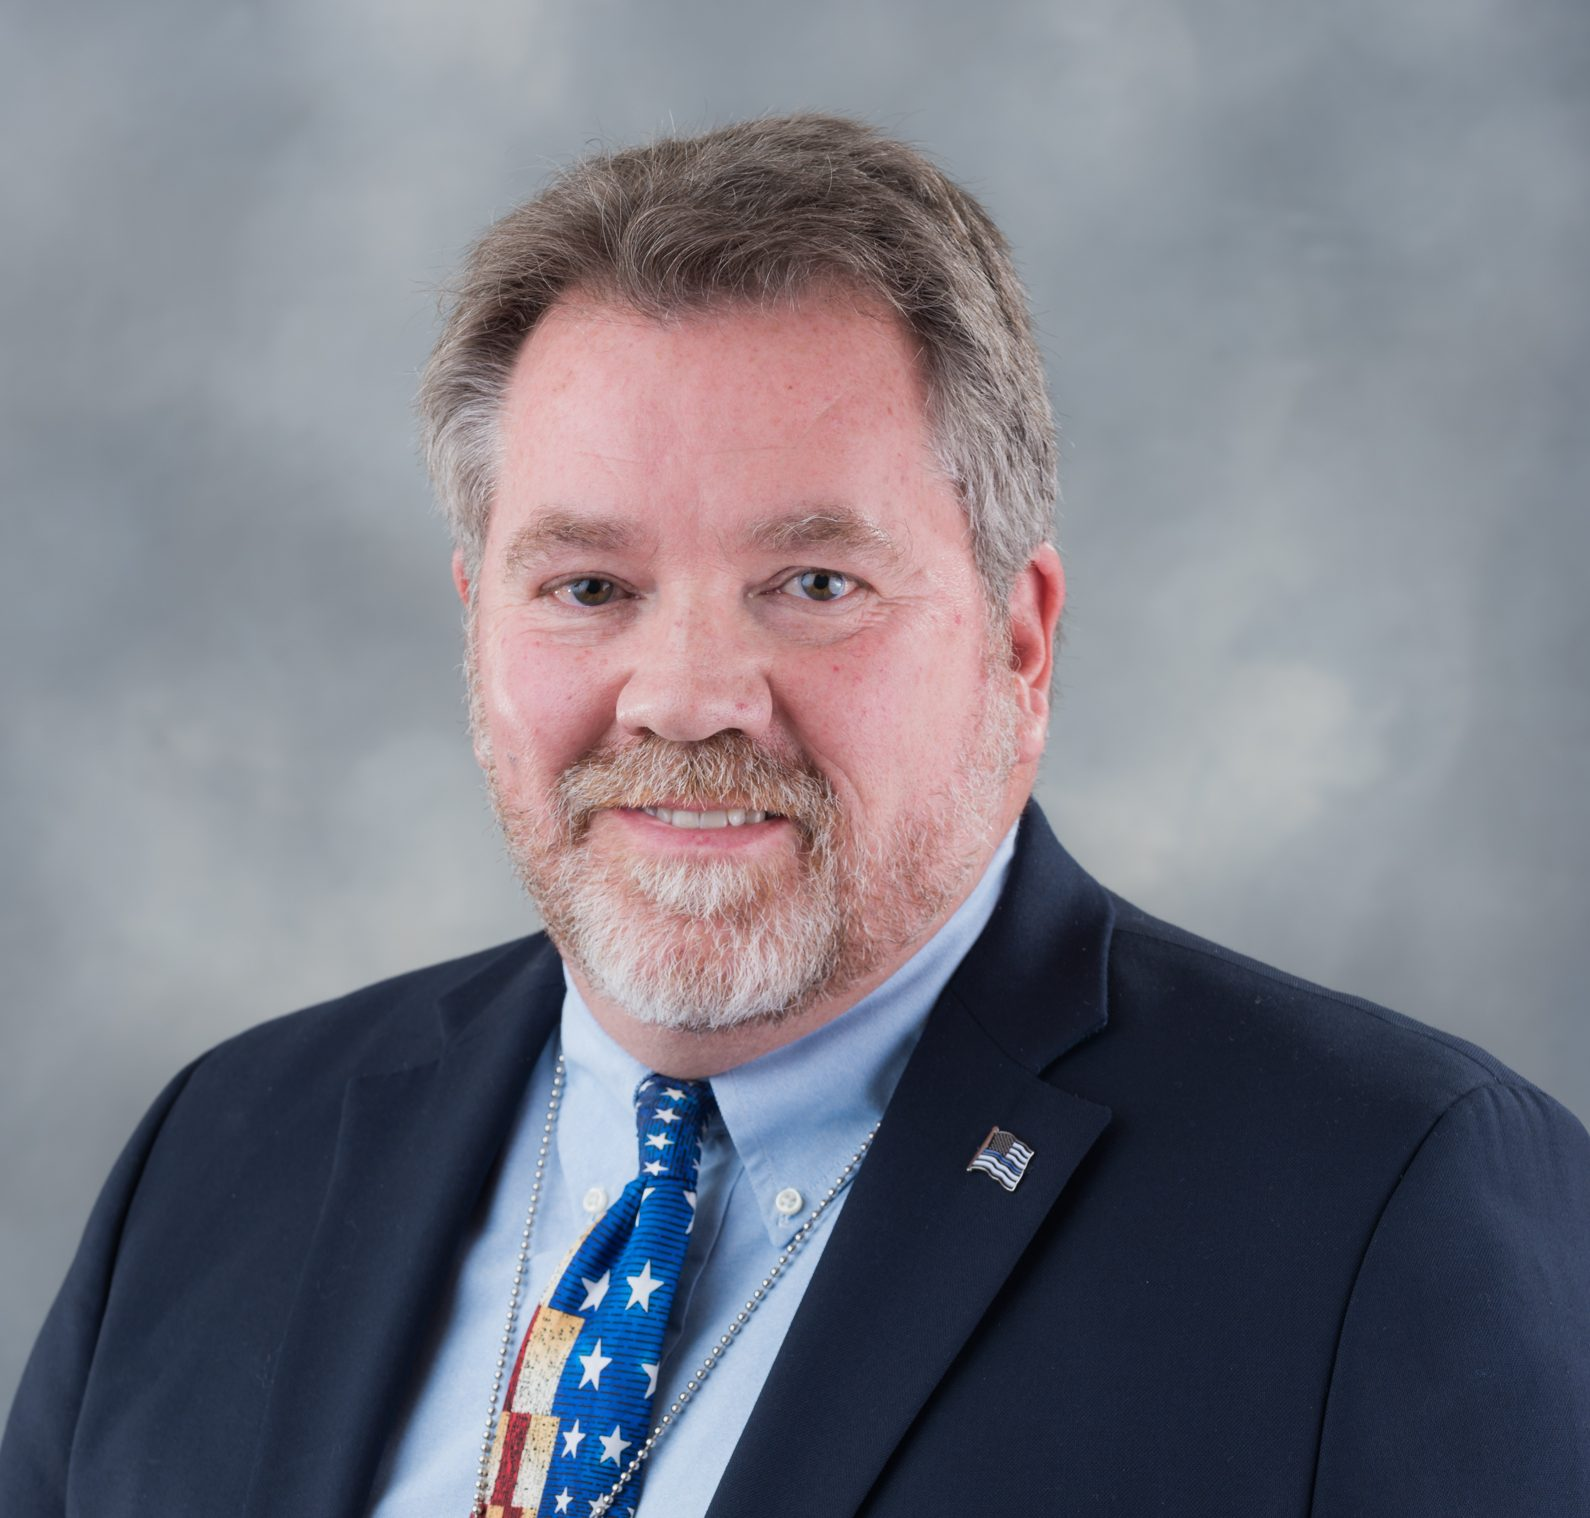 Spotlight on Campus Safety Director of the Year Finalist Joseph Markham